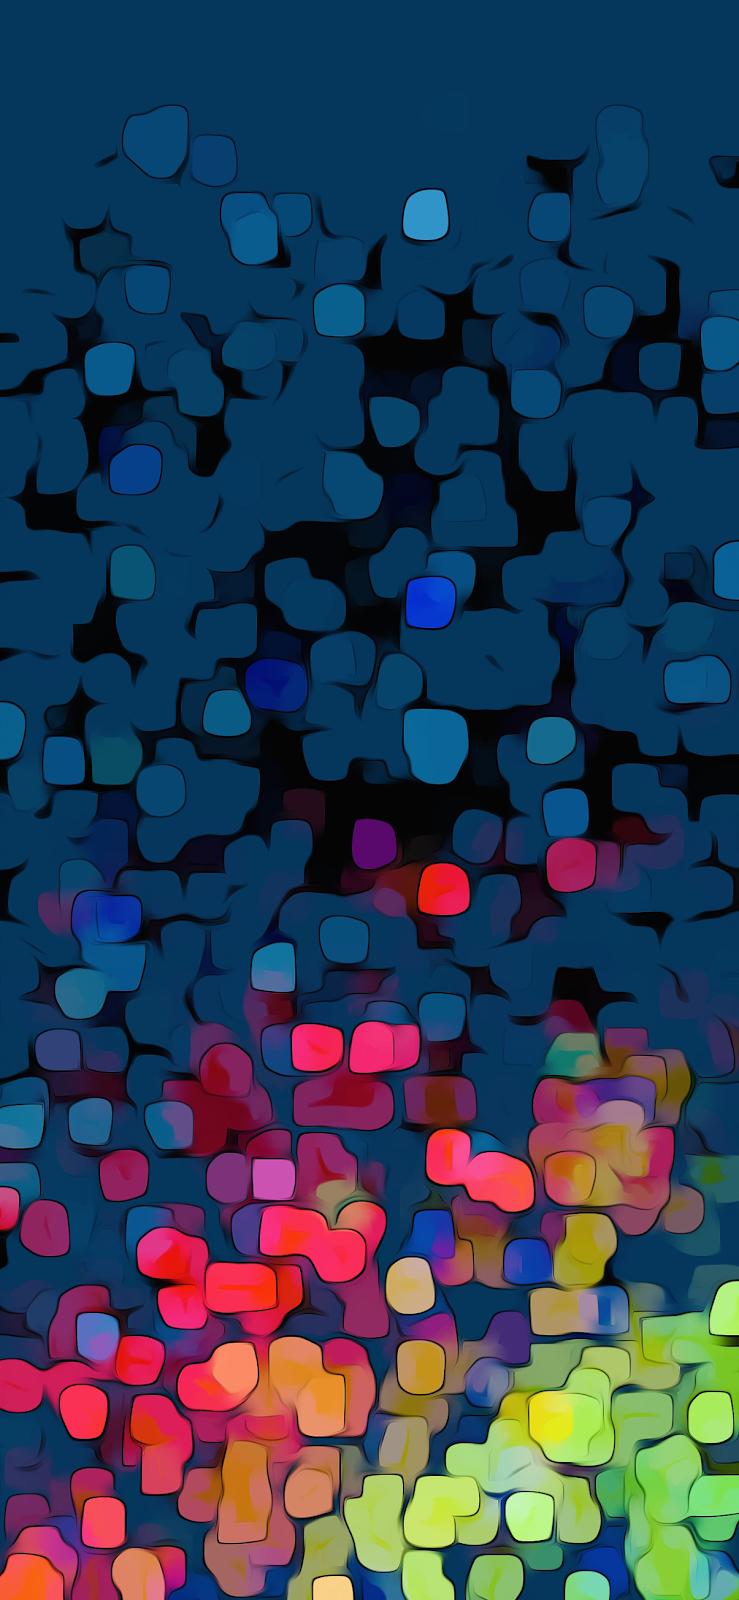 Fragments Iphone X Xs Xsmax Xr Wallpaper Iphone Android Background Followme Retina Wallpaper Abstract Iphone Wallpaper Samsung Wallpaper